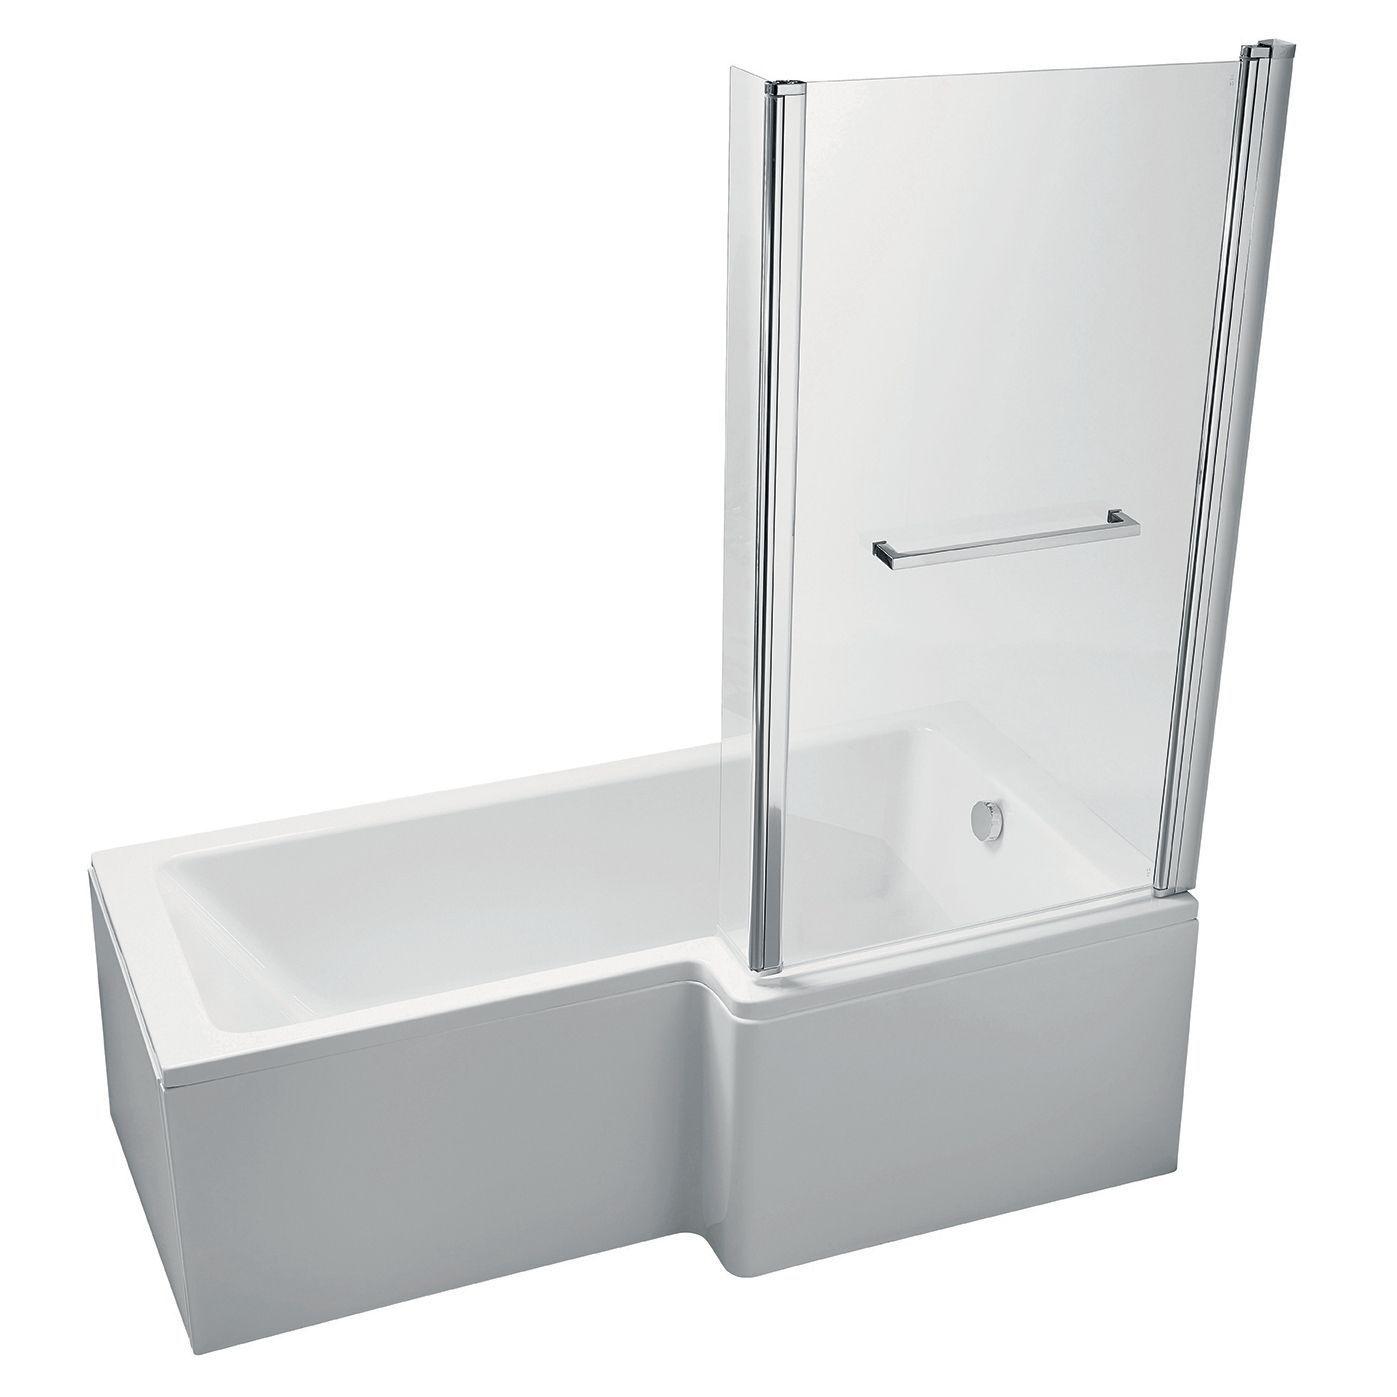 Ideal Standard Imagine RH Acrylic Rectangular Shower Bath, Front Panel &  Screen (L)1695mm (W)845mm   Departments   DIY at B&Q